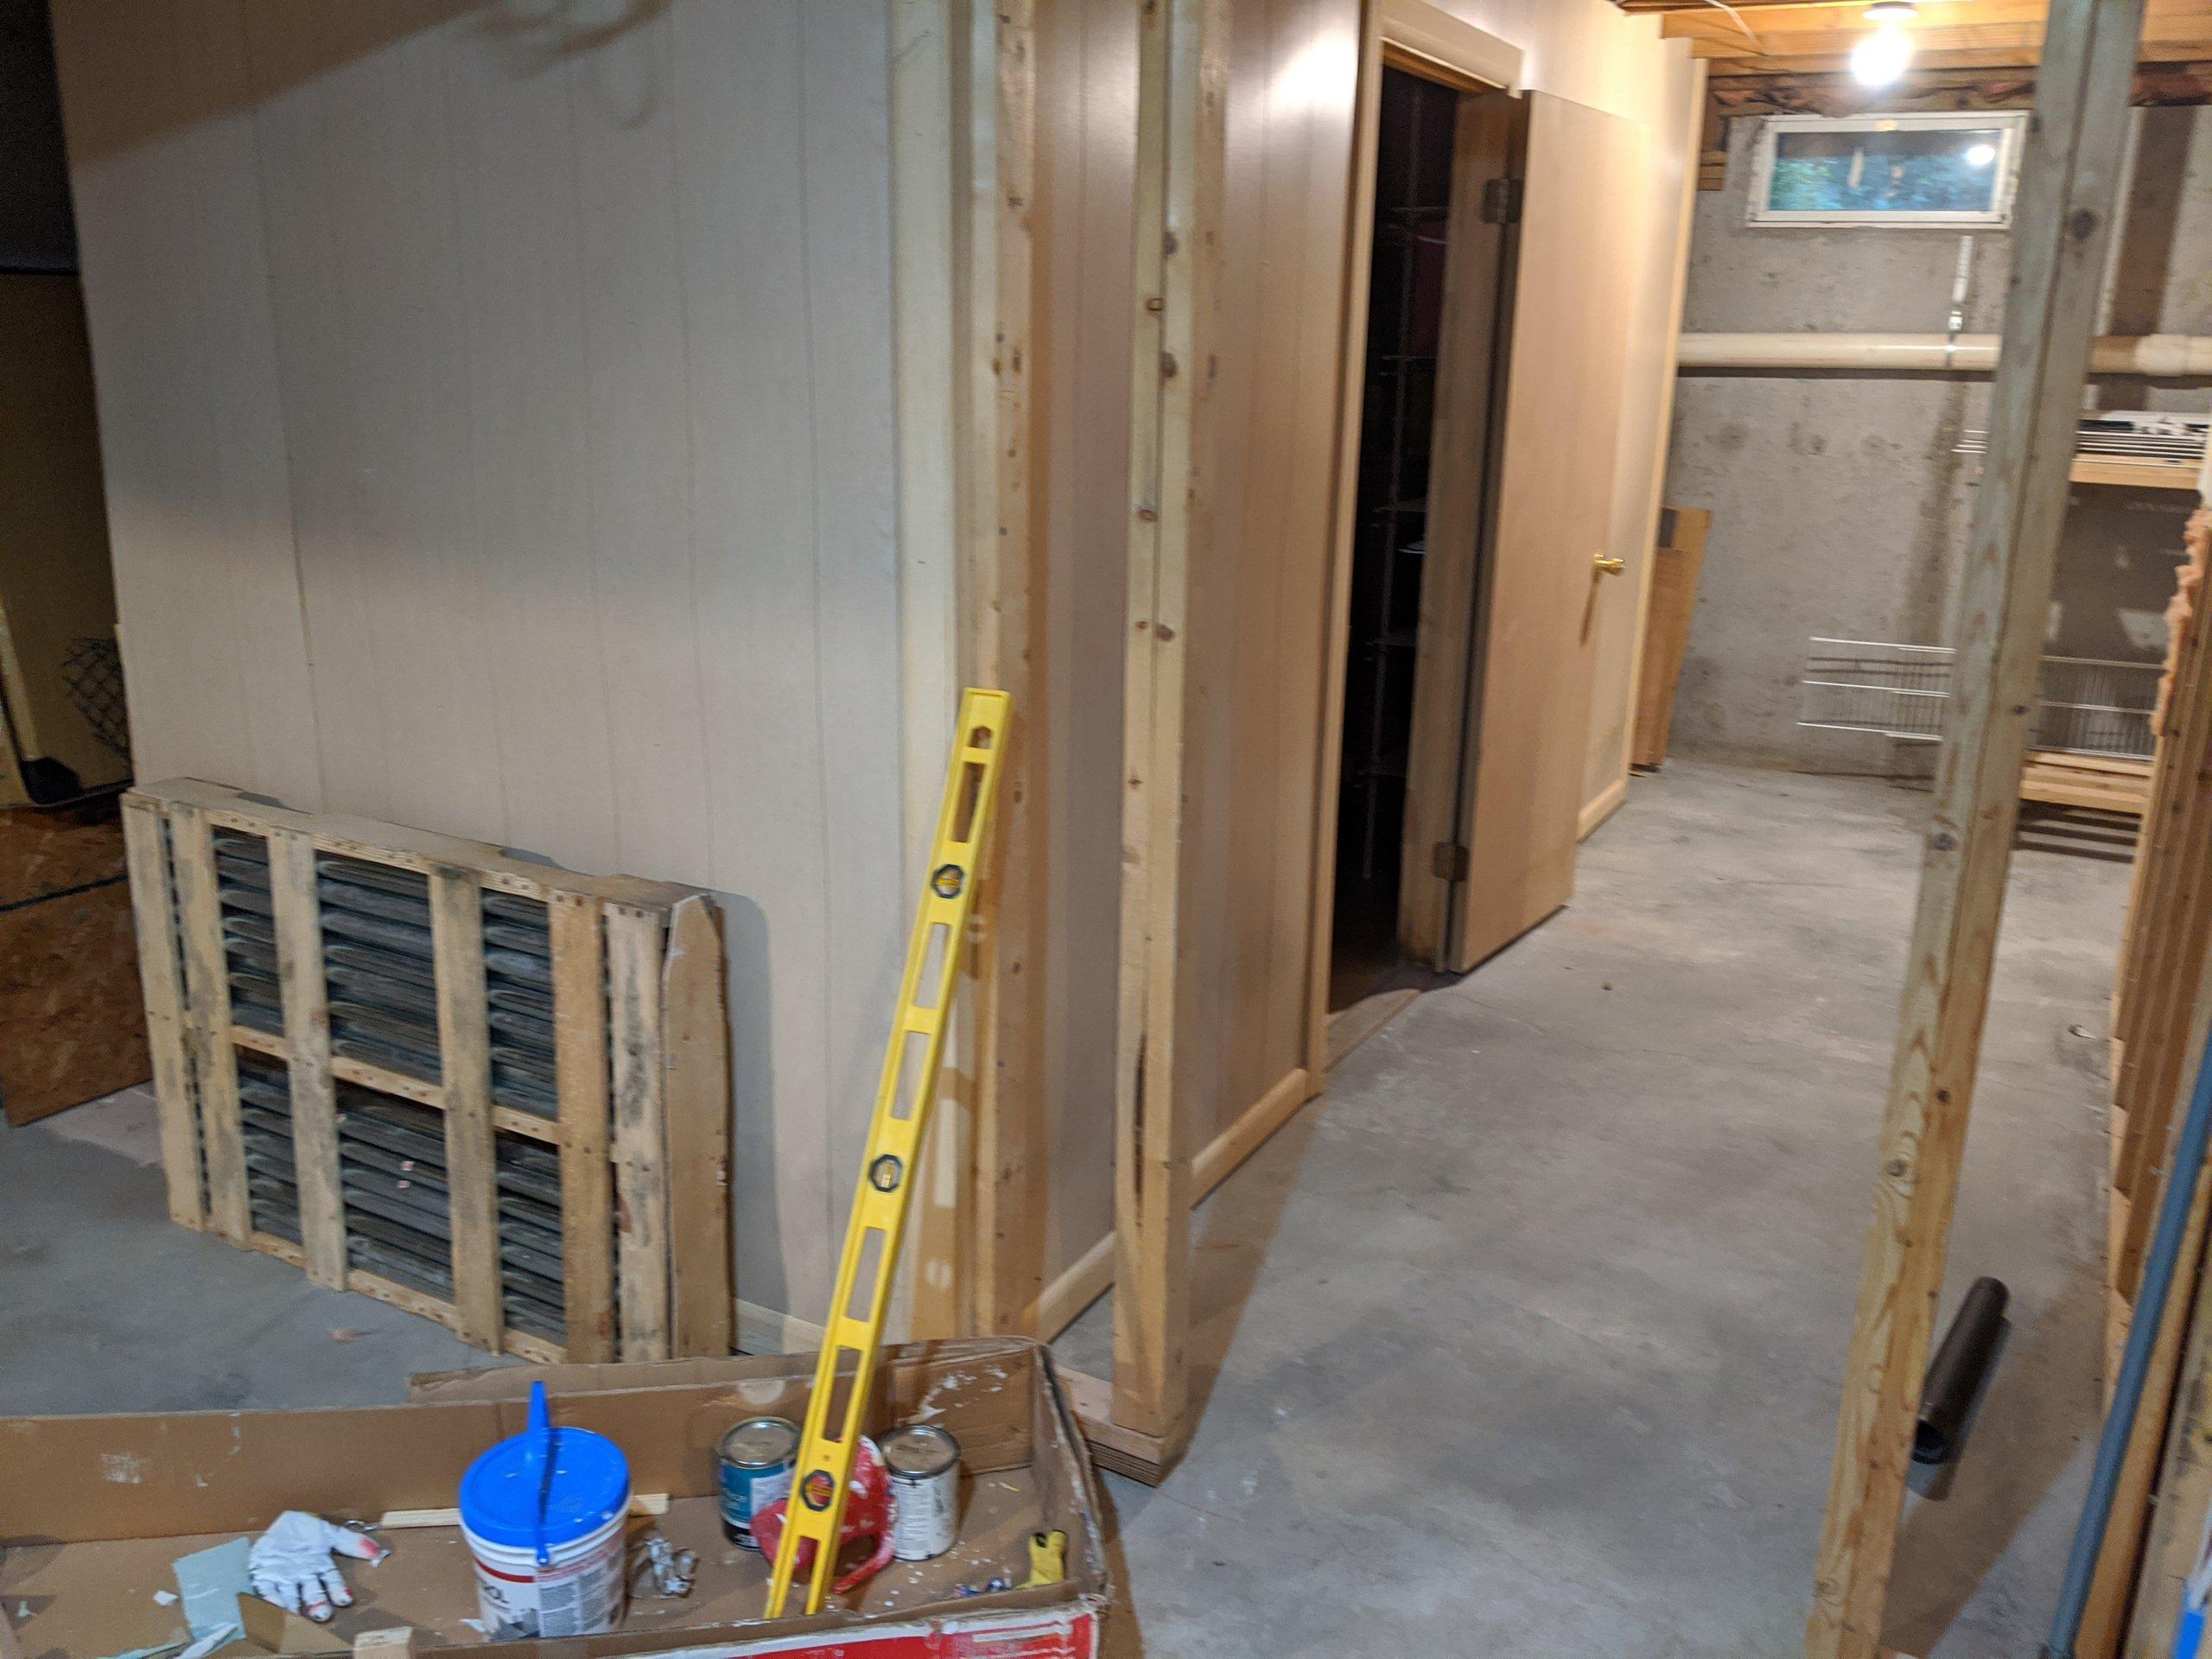 40x25 Basement self storage unit